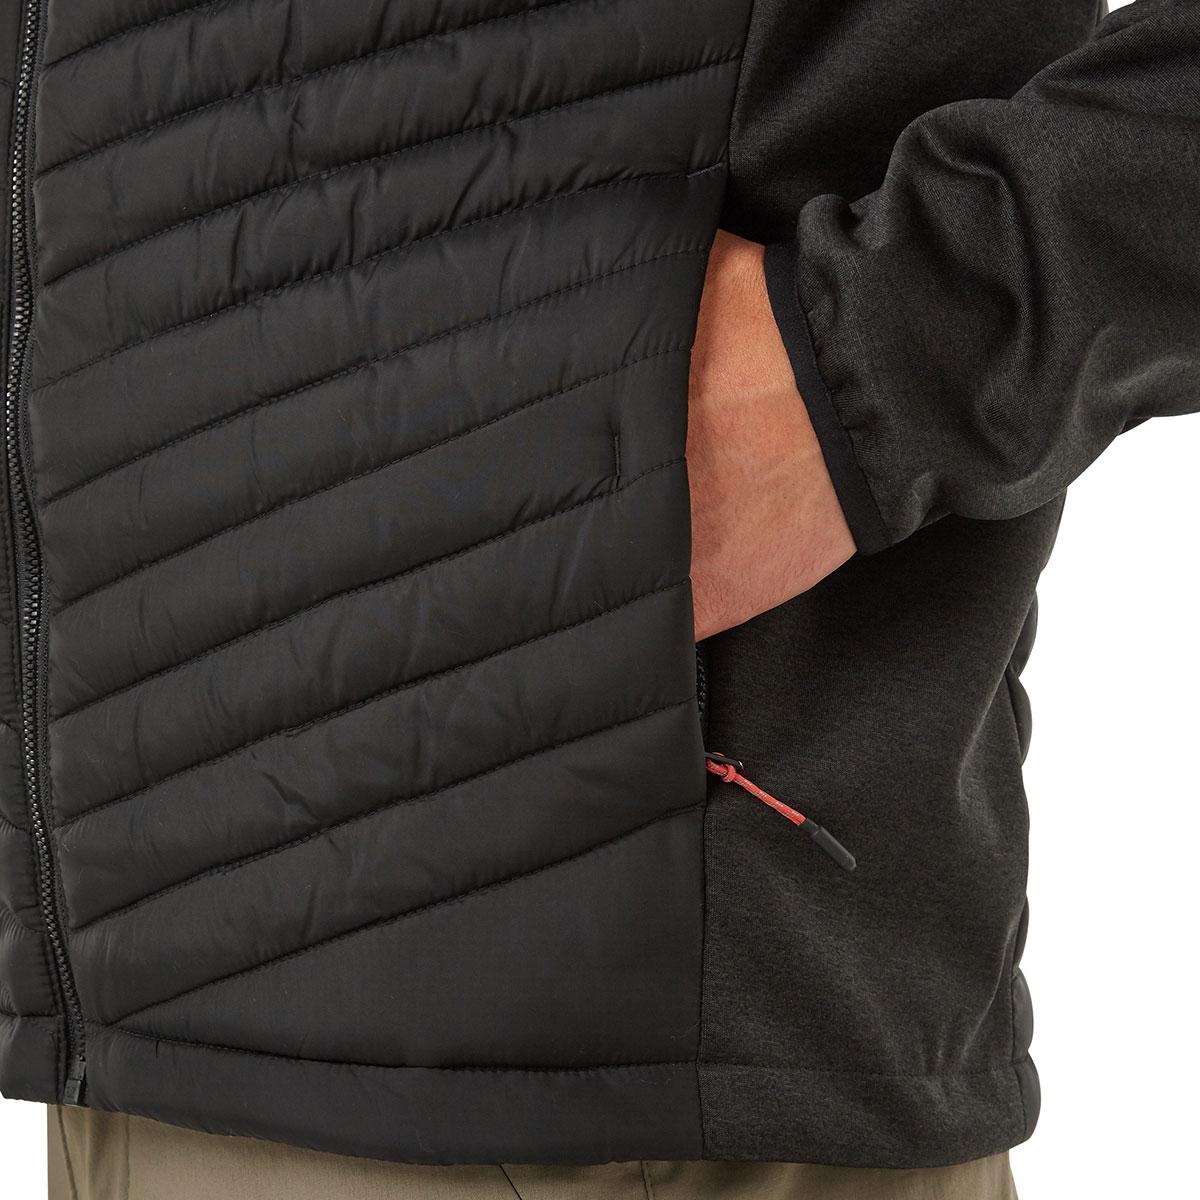 Craghoppers Mens Innsbruck Hybrid Thermal Windproof Eco Jacket 30/% OFF RRP